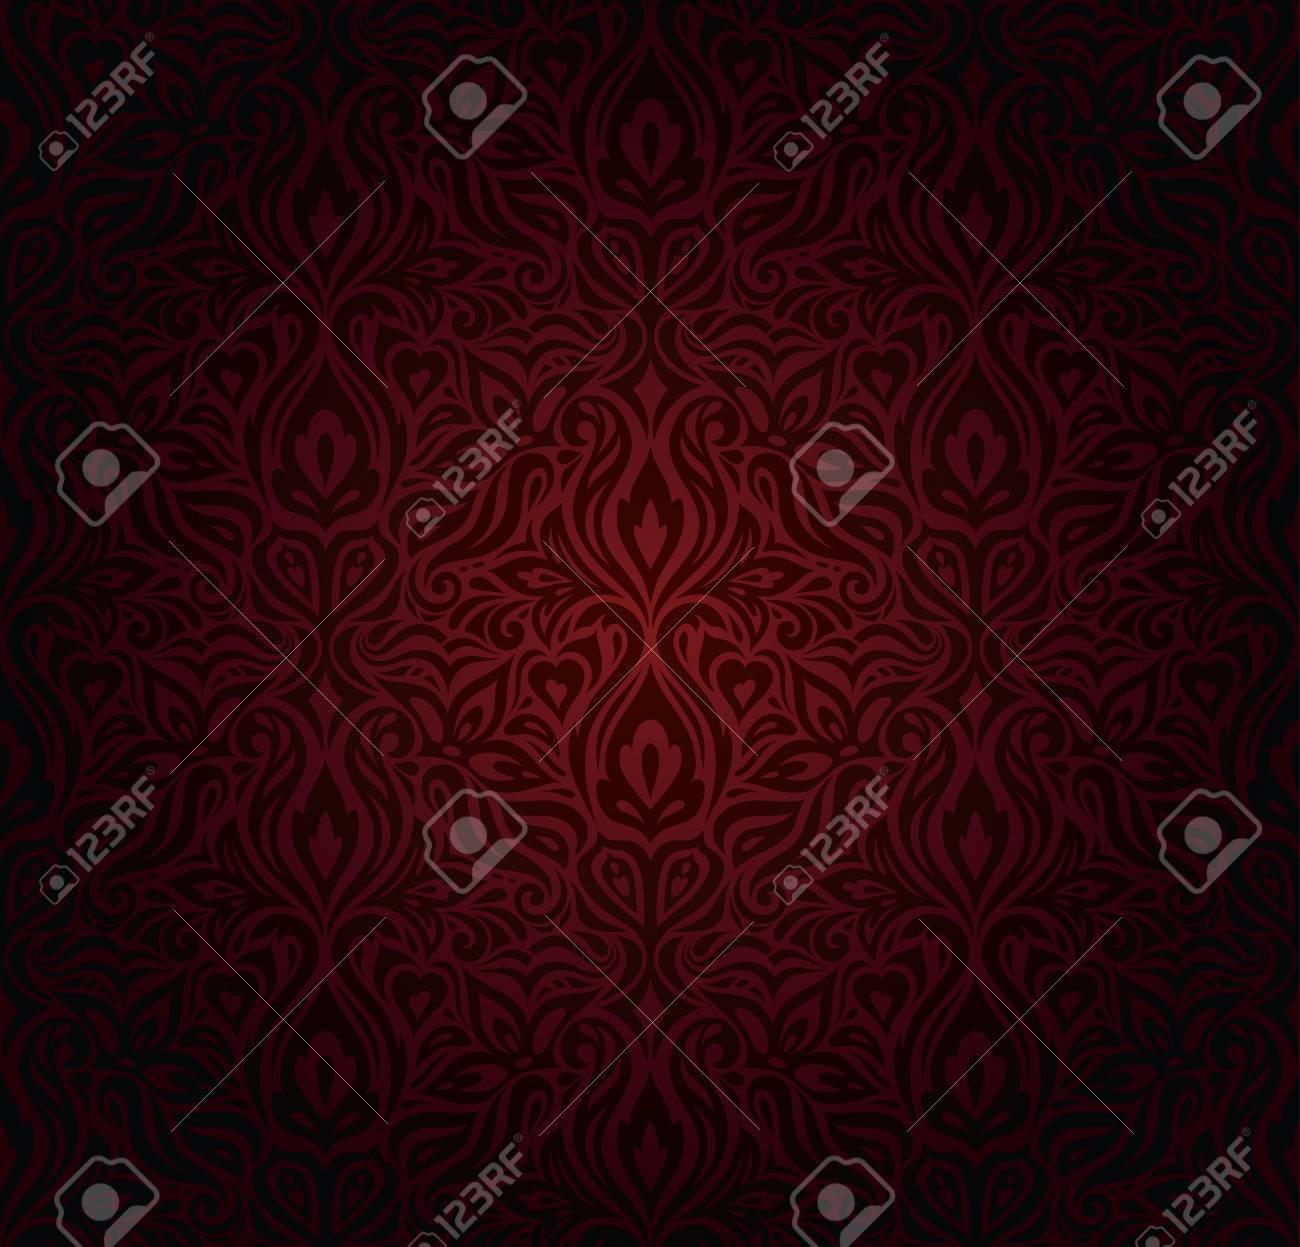 Dark red brown floral wallpaper seamless vector design background in vintage style - 108455925